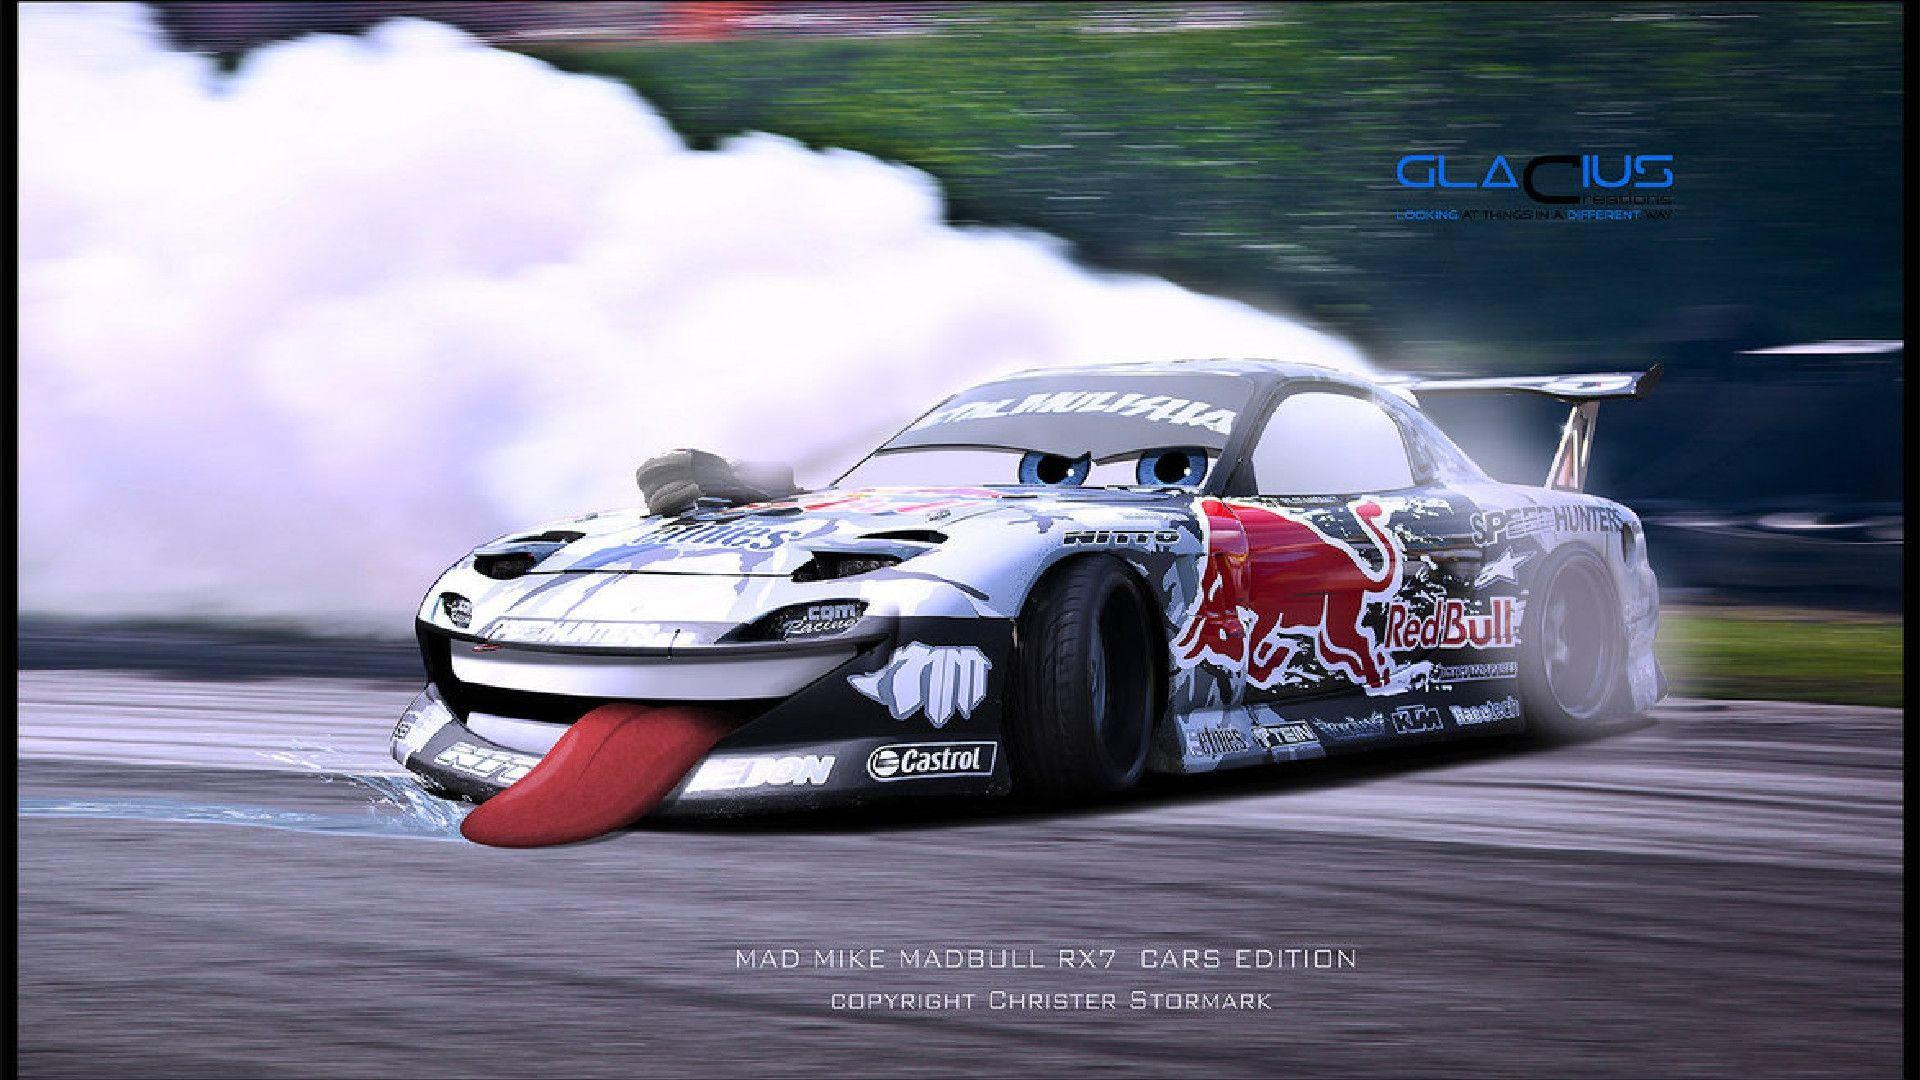 Rc Drift Car Wallpapers Hd Wallpaper Cave